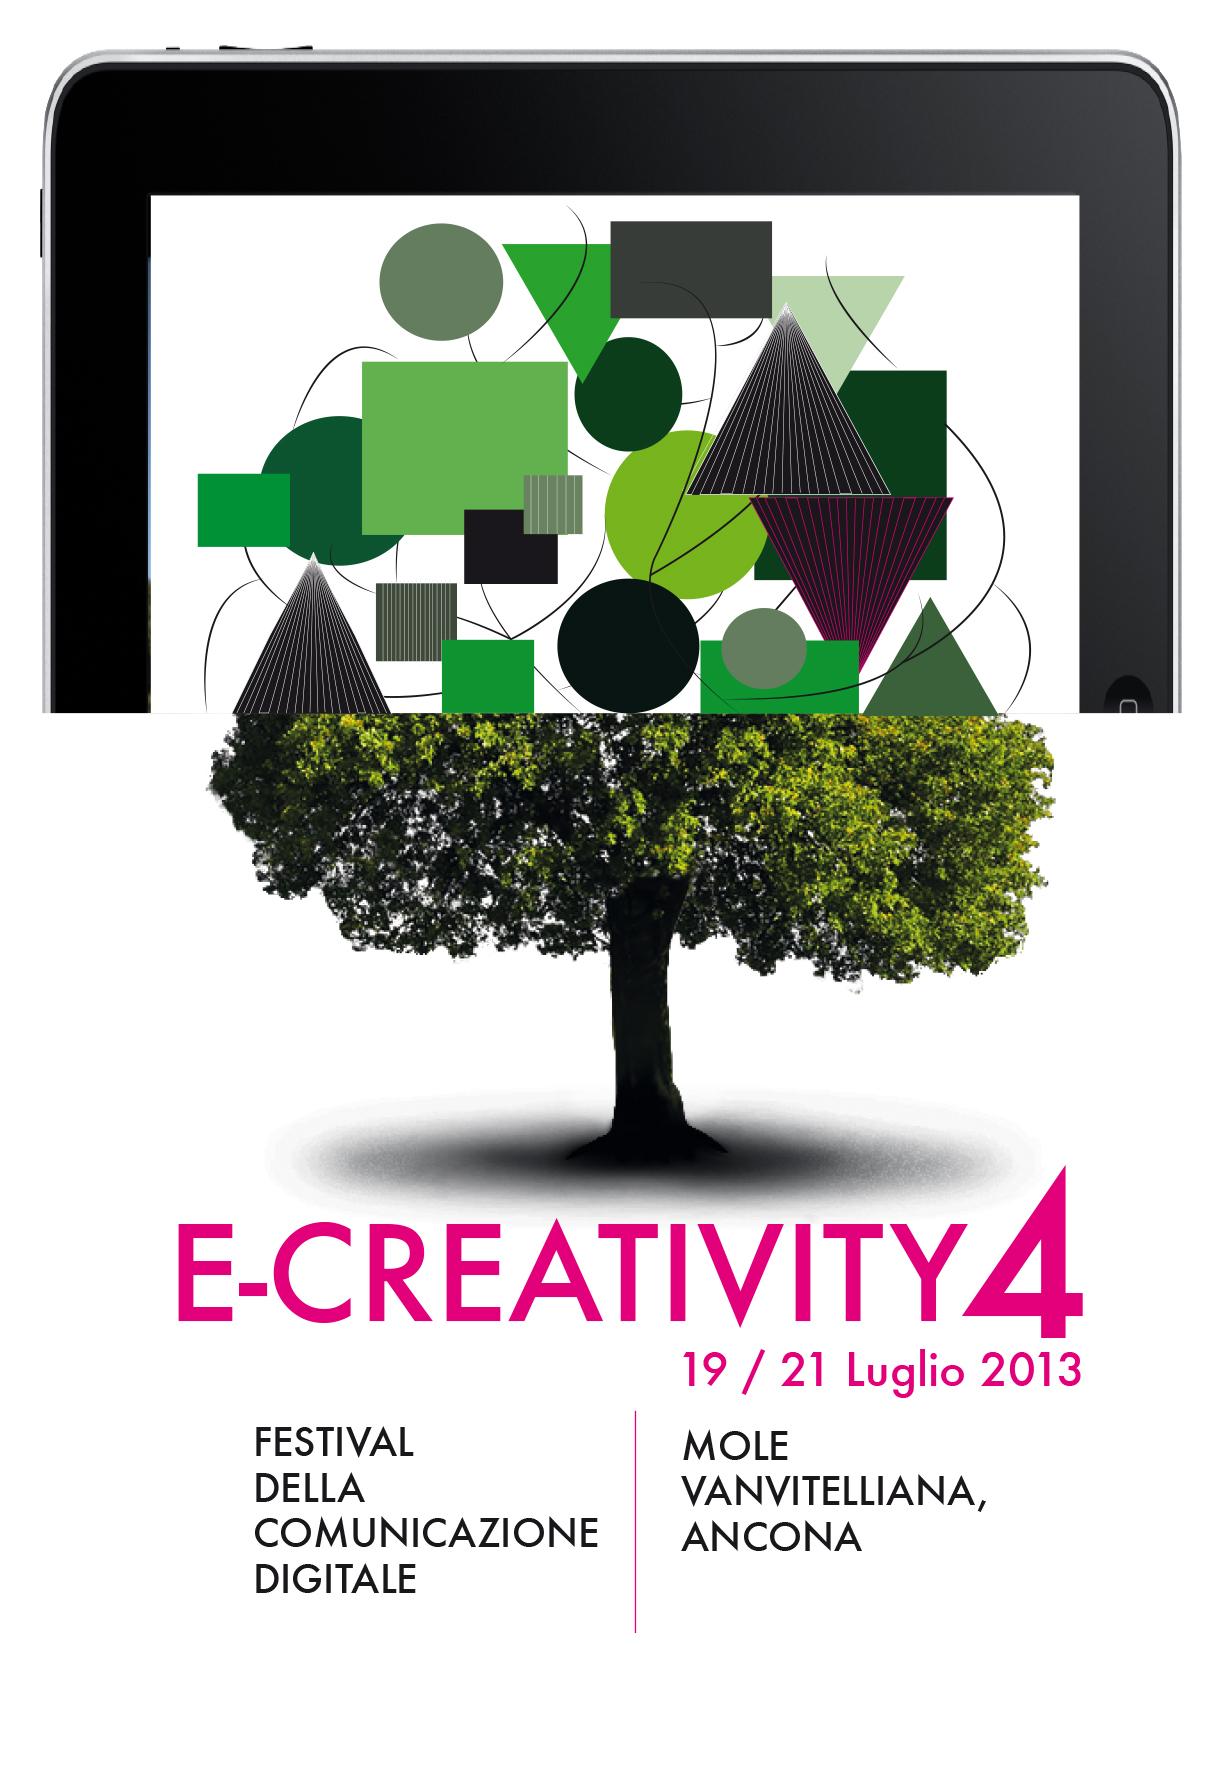 FLYER E-creativityt4